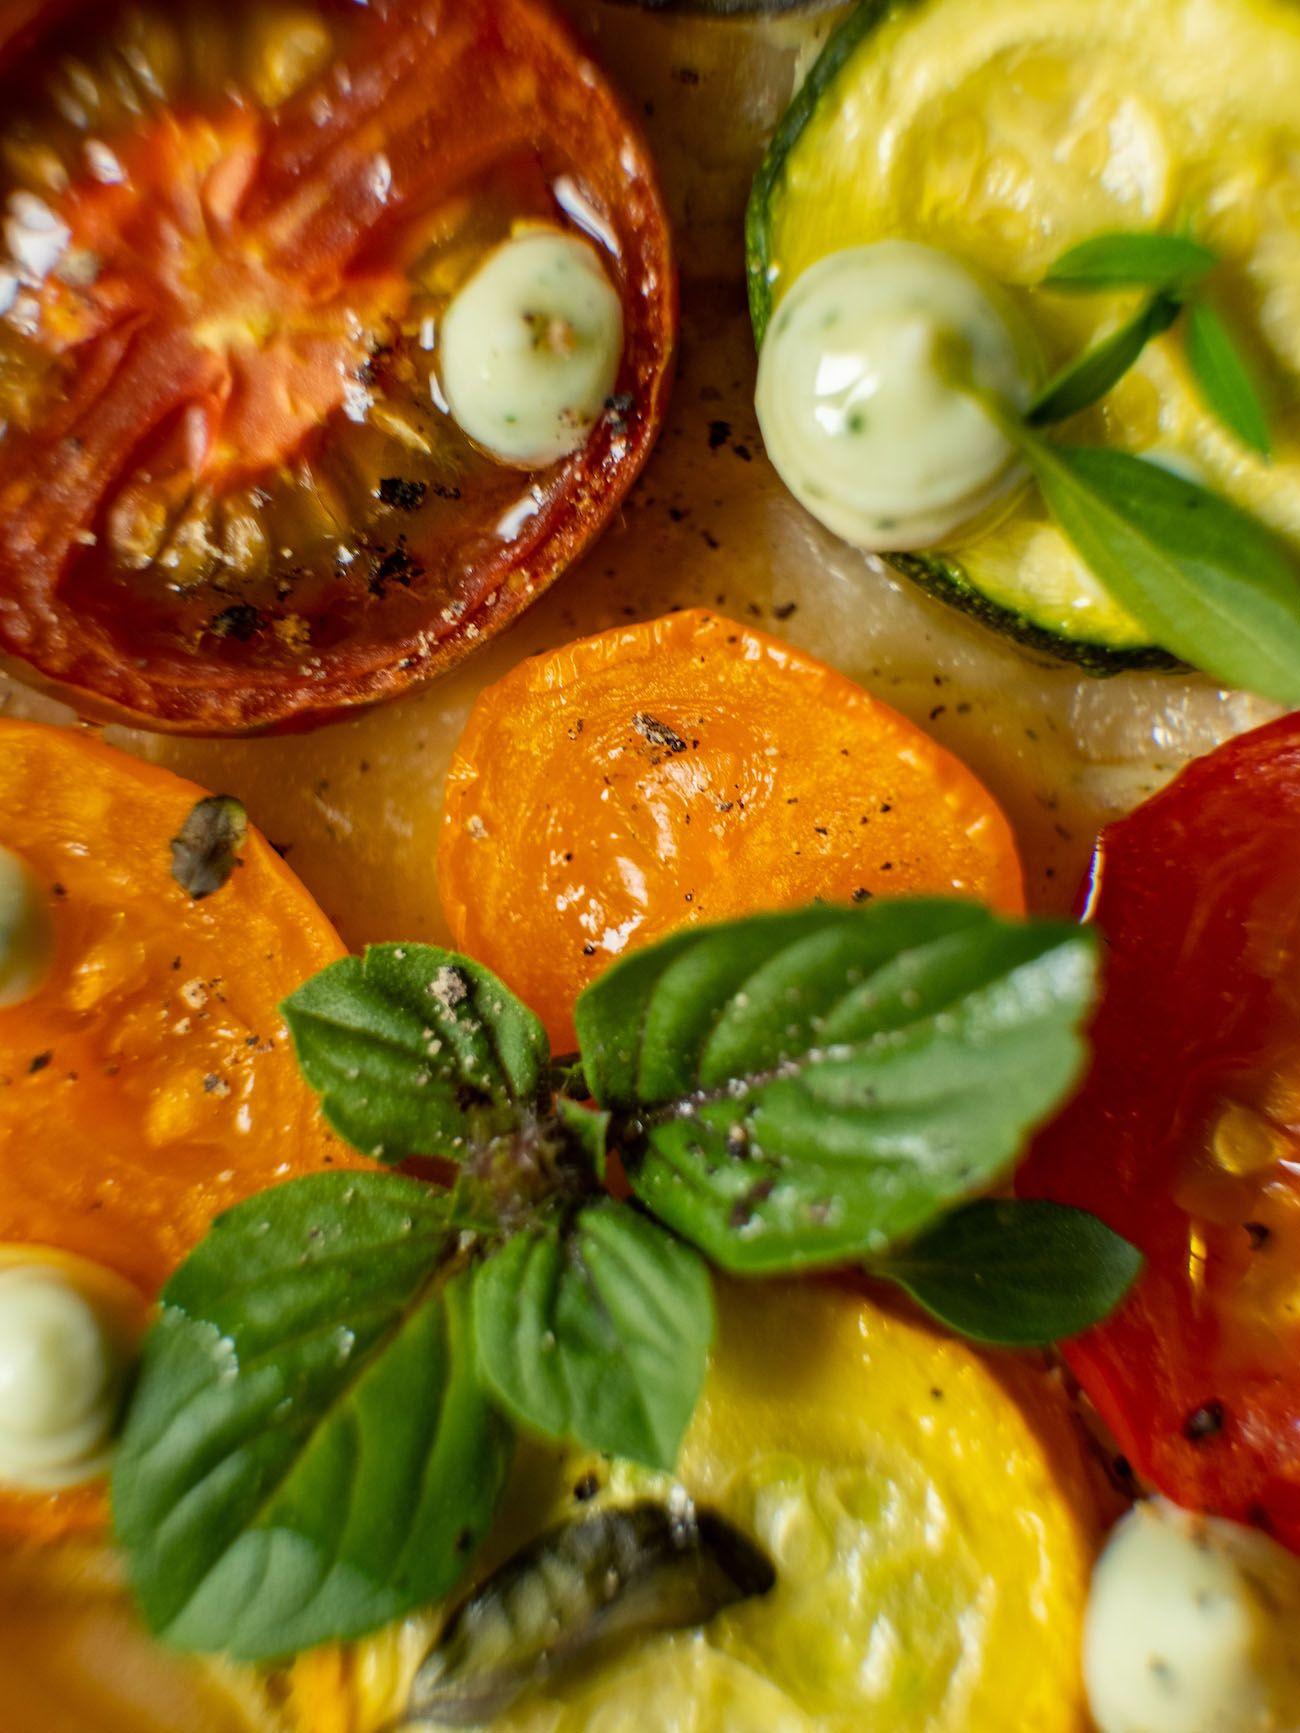 Rezept, Foodblog, About Fuel, Tomaten Zucchini Tartelettes mit Basilikum Feta Creme, Oregano, Oivenöl